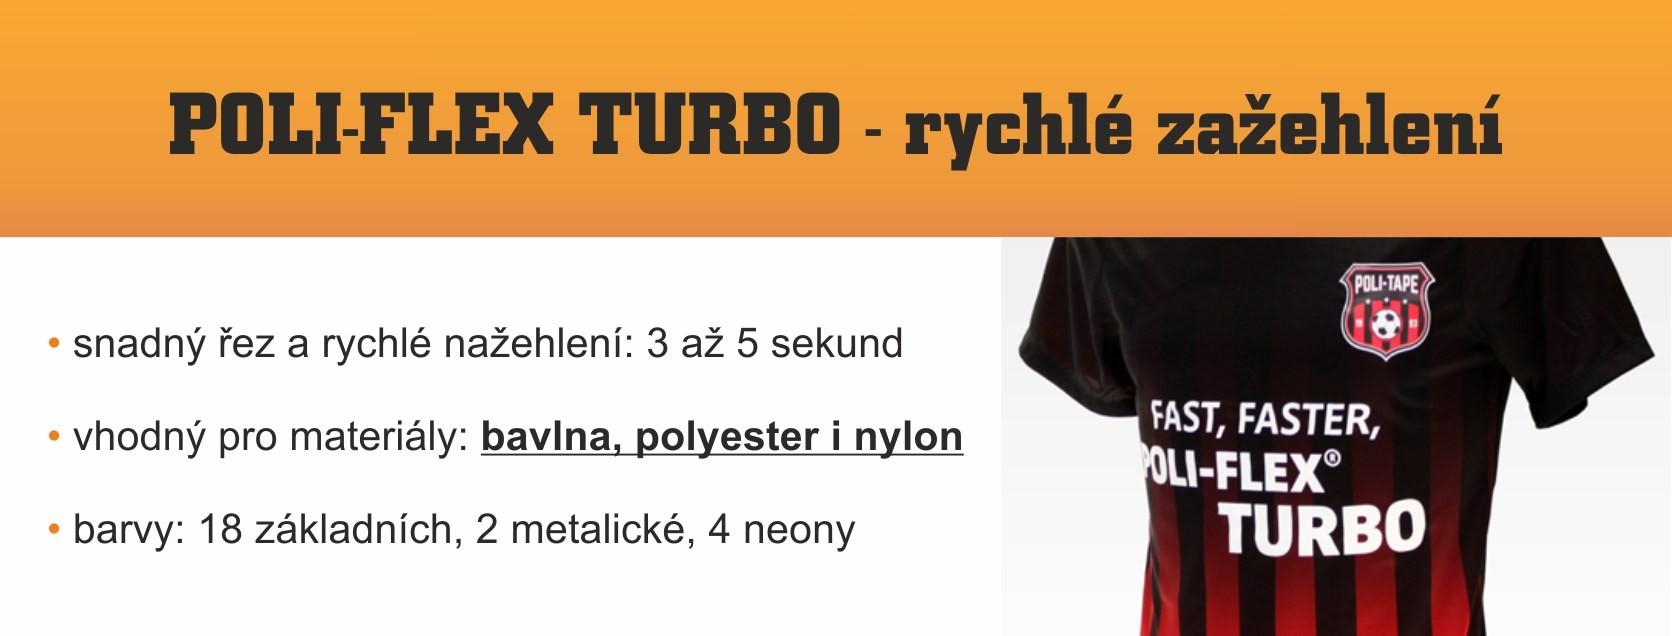 NOVINKA - Poli-Flex TURBO